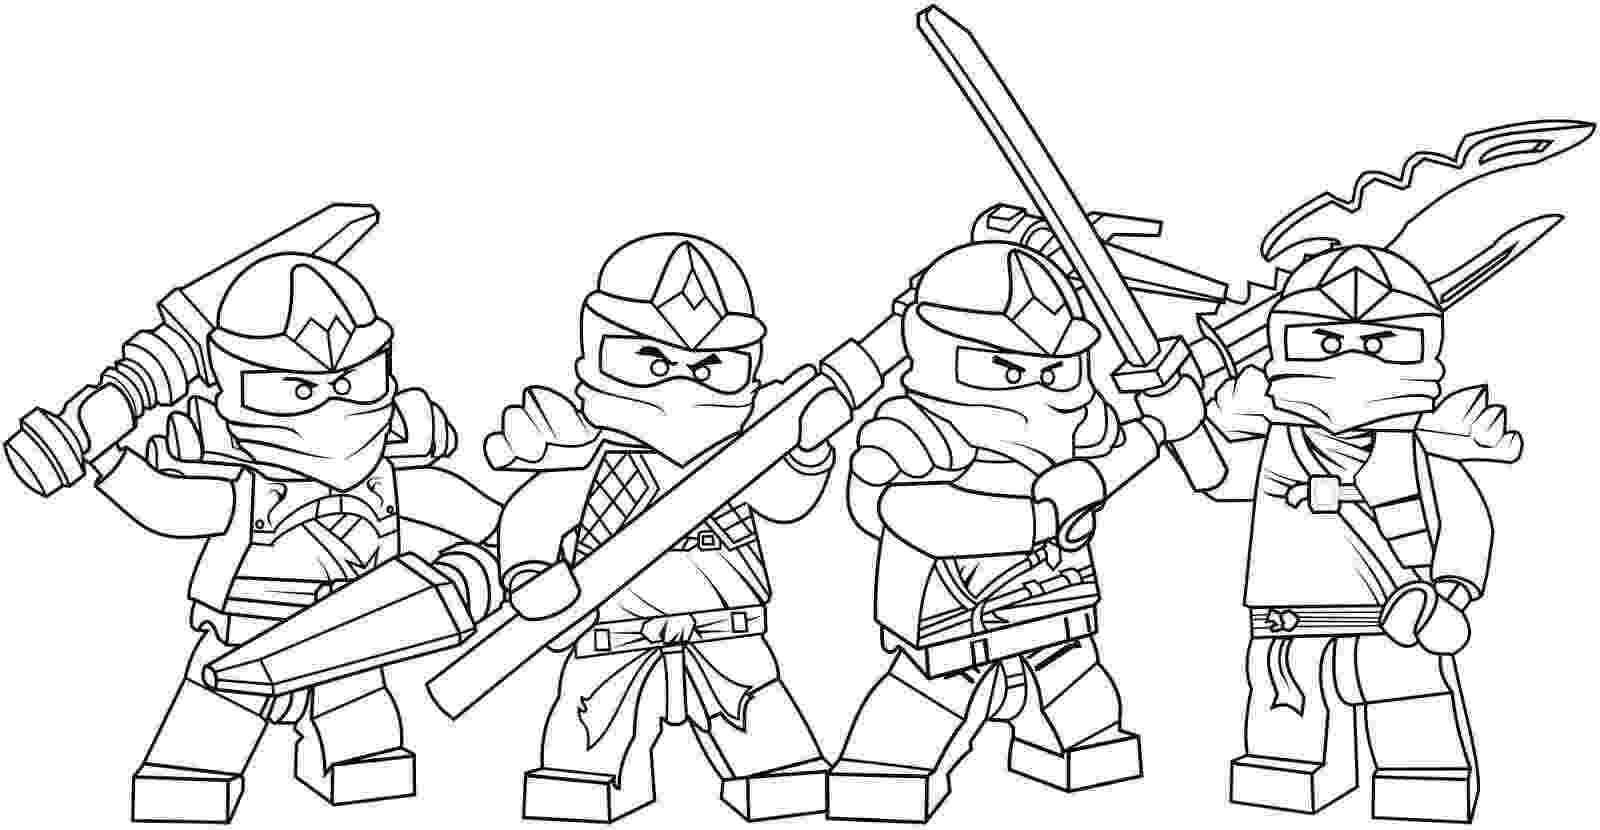 pictures of lego ninjago lego ninjago coloring pages fantasy coloring pages of pictures lego ninjago